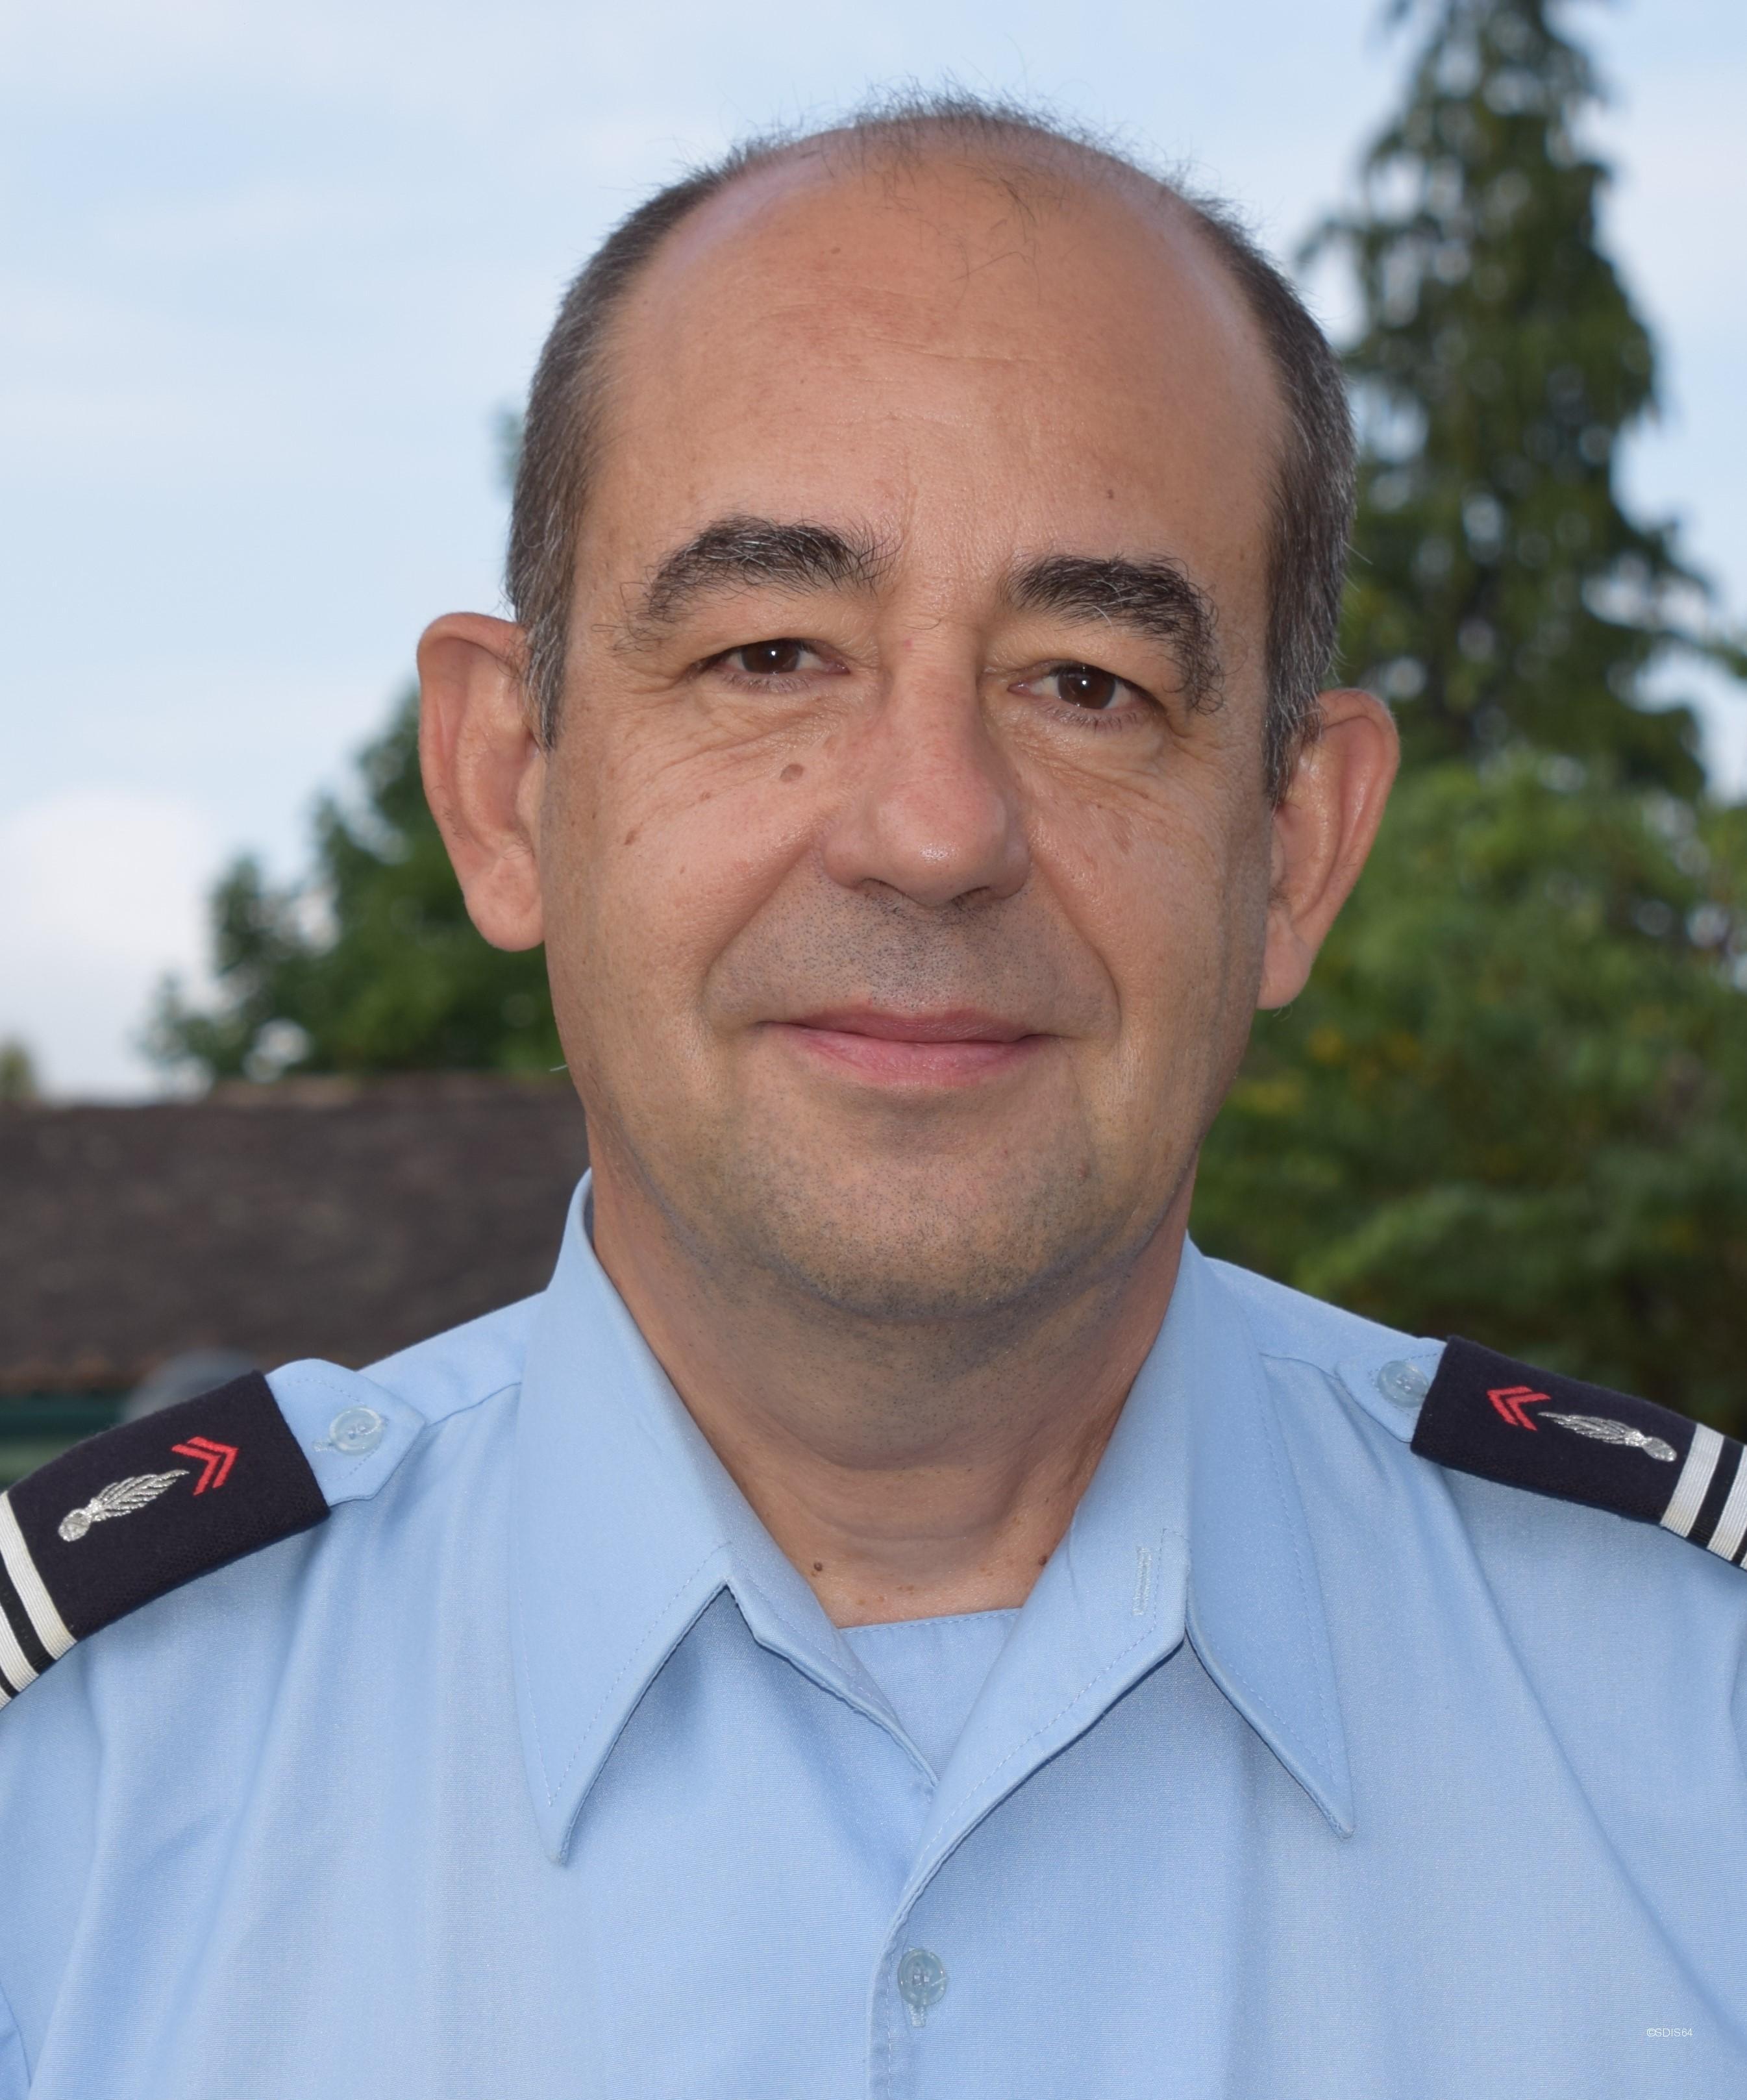 Lt-colonel POISSON